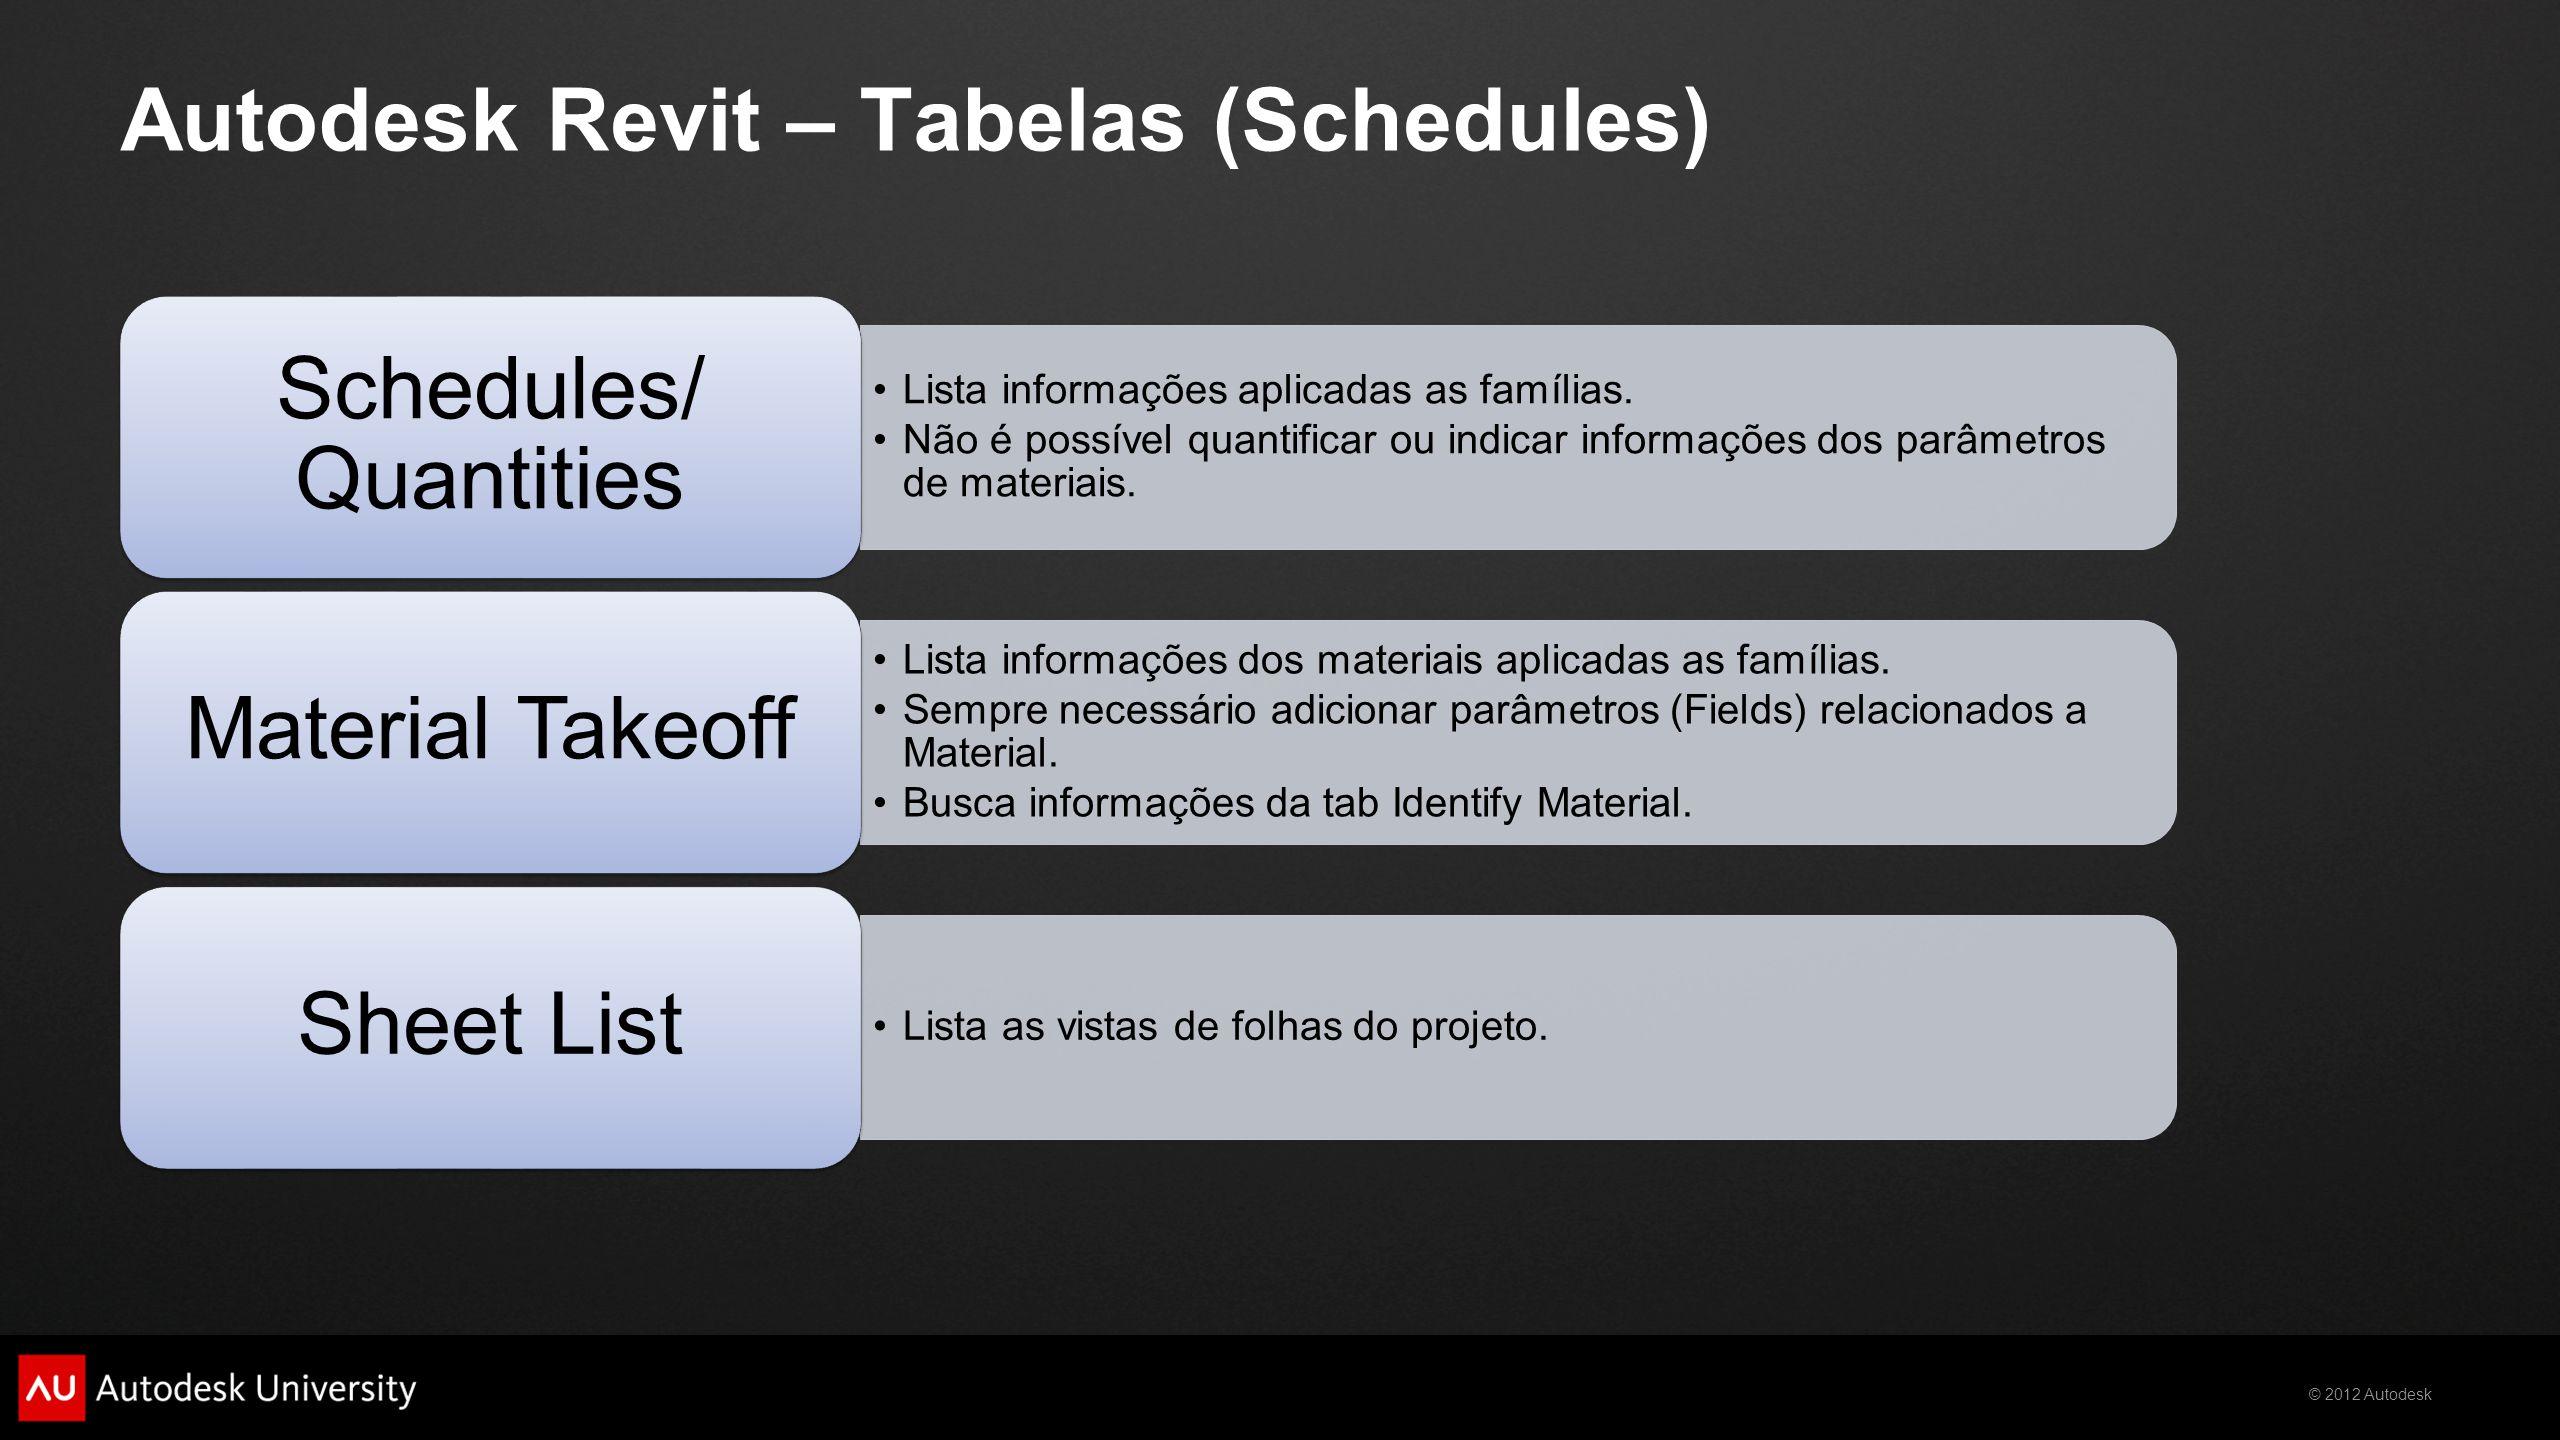 © 2012 Autodesk Autodesk Revit – Tabelas (Schedules) 1.